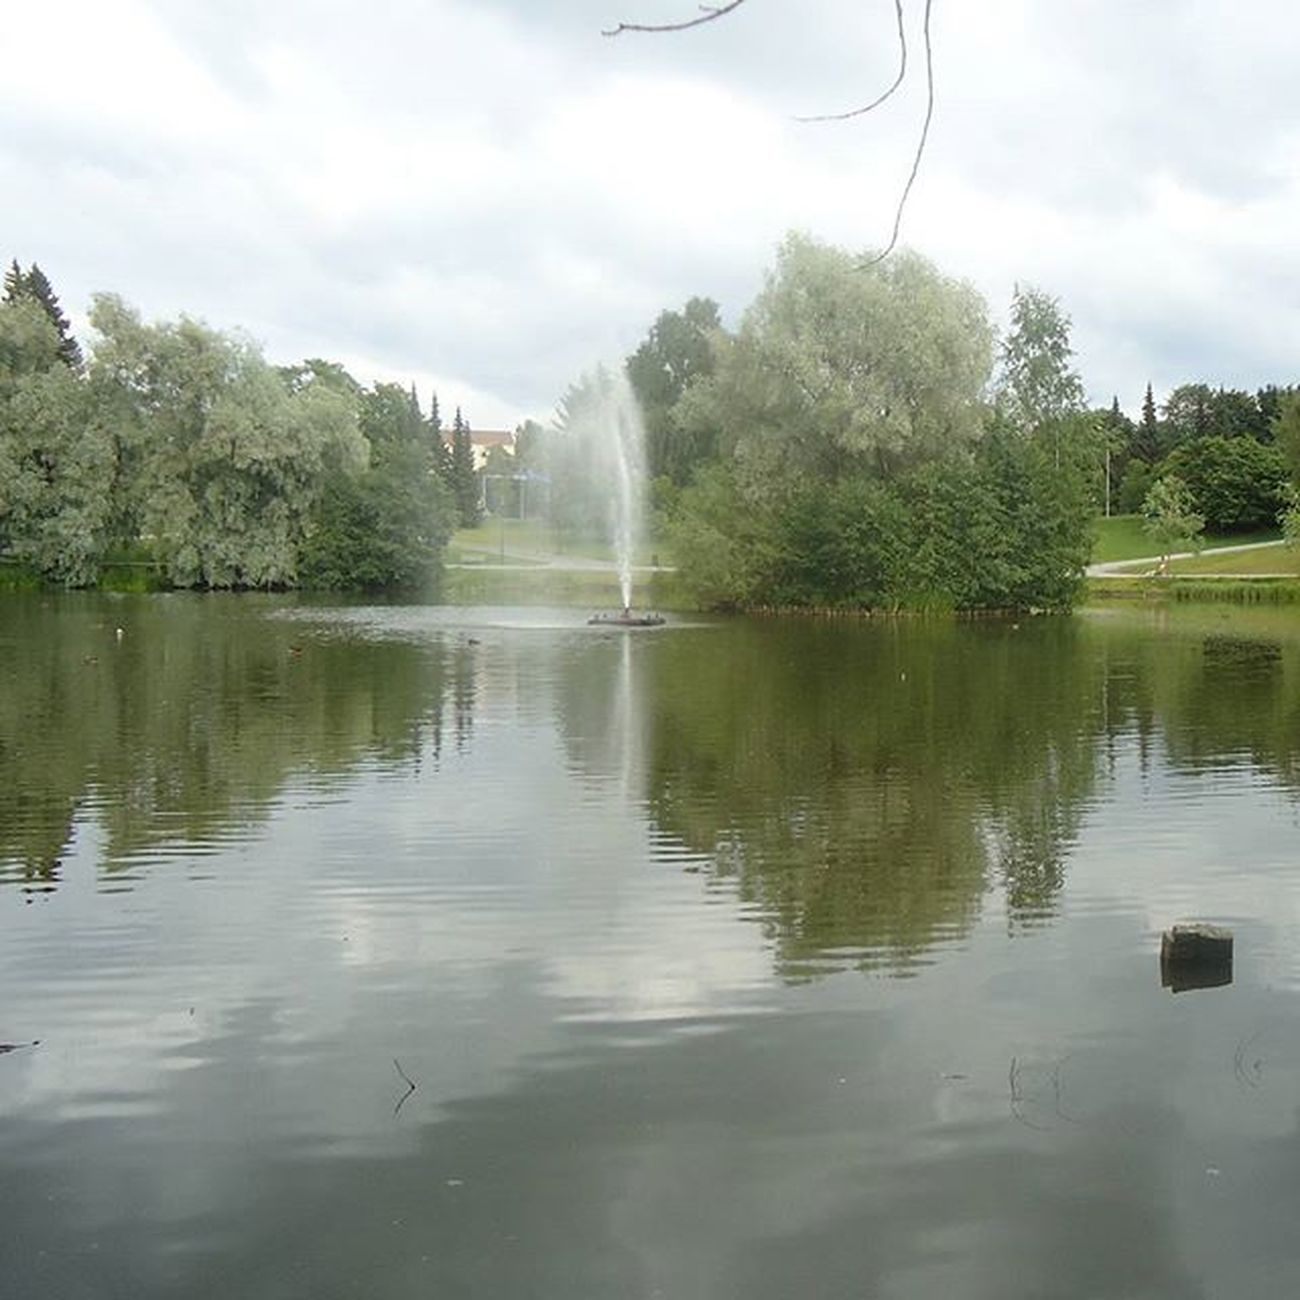 Sorsapuisto Tamperelove Tampereallbright Tampere Tre Visittampere Visitfinland Finland Suomi Puisto Park Parque  Beautiful Kaunis Water Vetta Kaunistampere